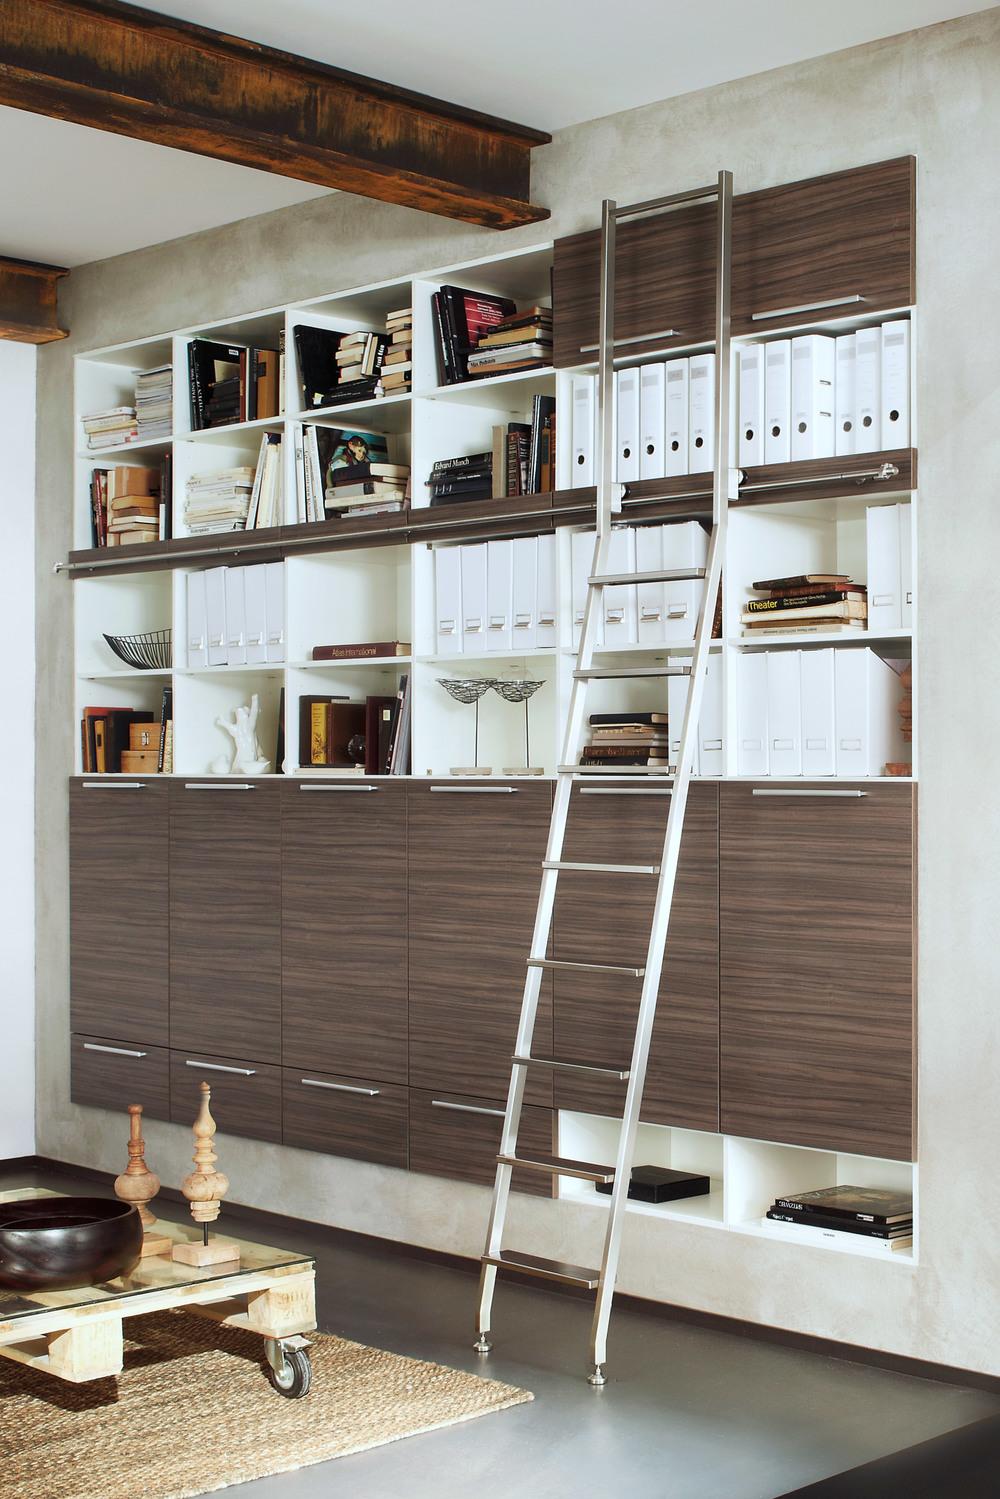 SL.6006 Tangens Ladders